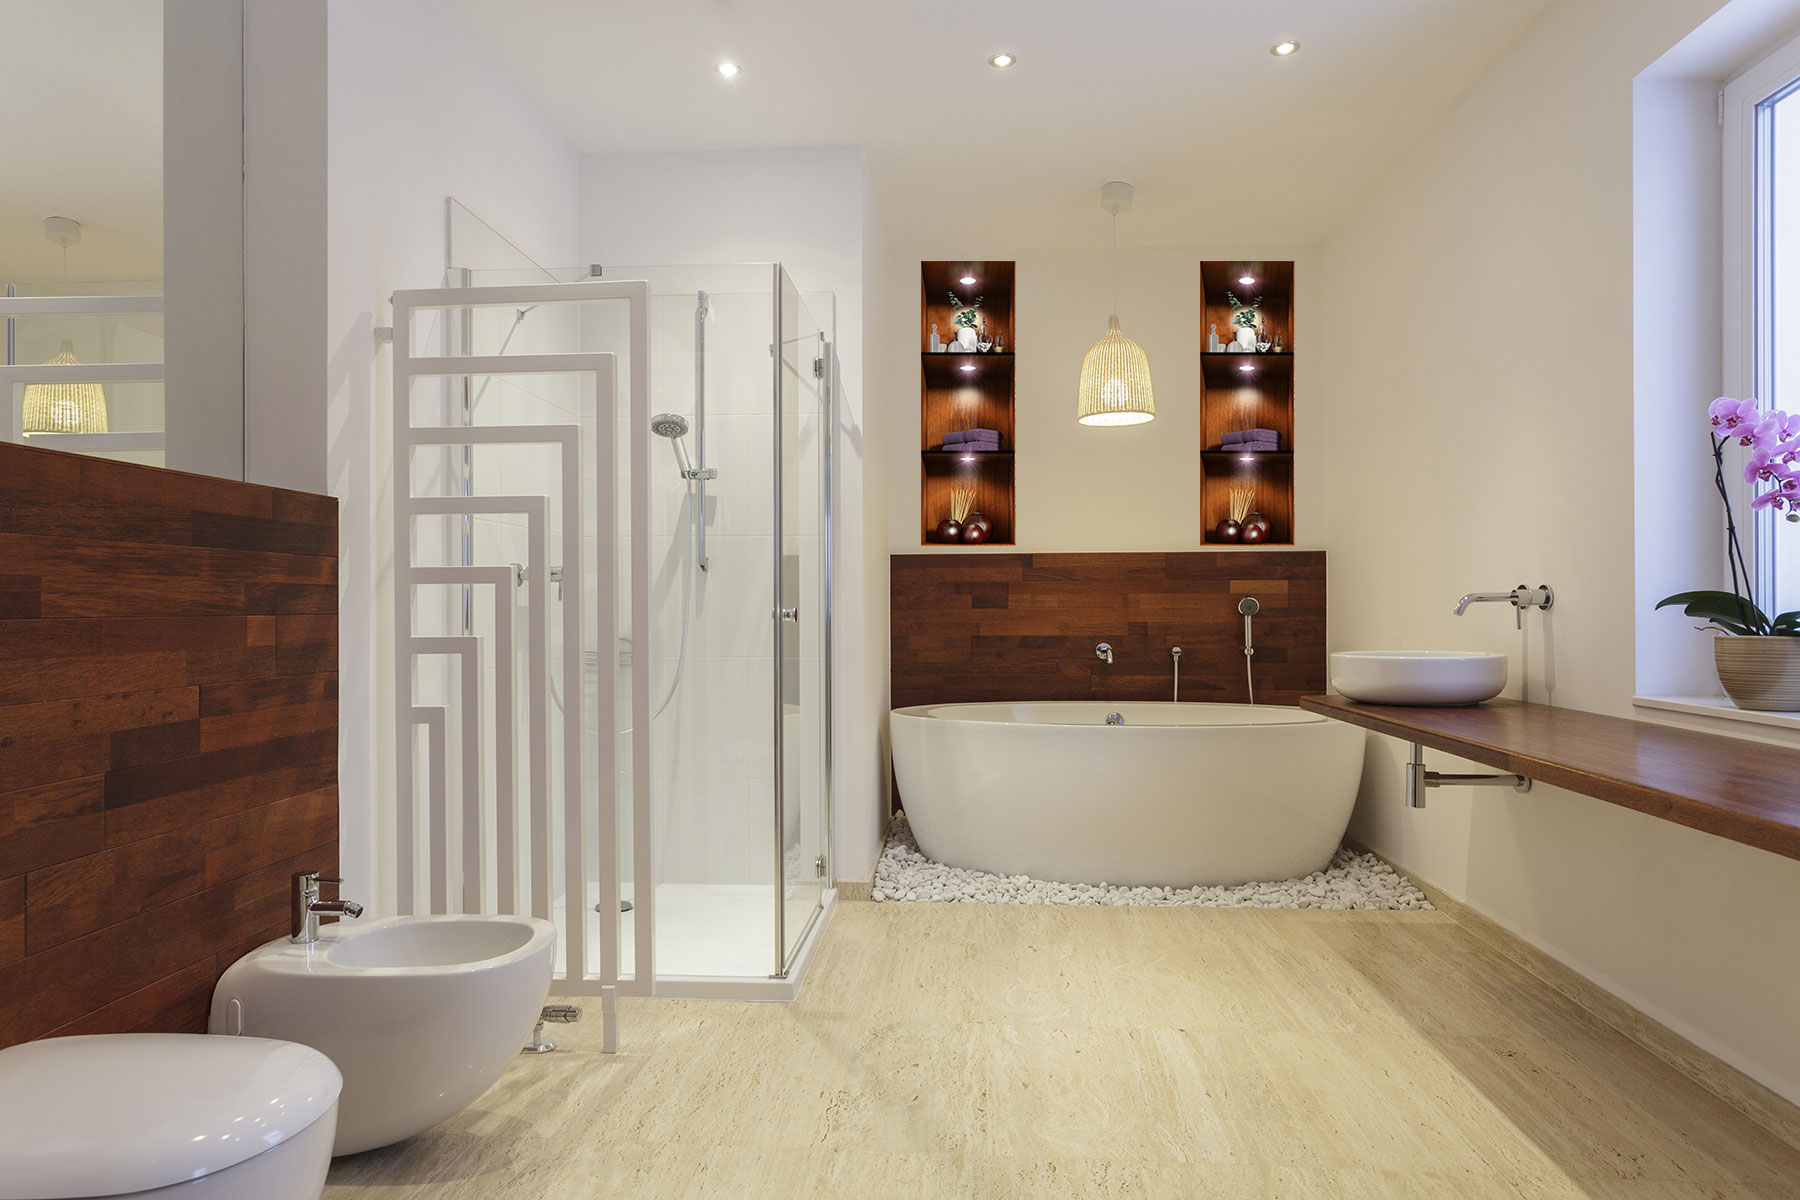 Sticker effet 3d salle de bain ambiance spa stickers art for 3d salle de bain